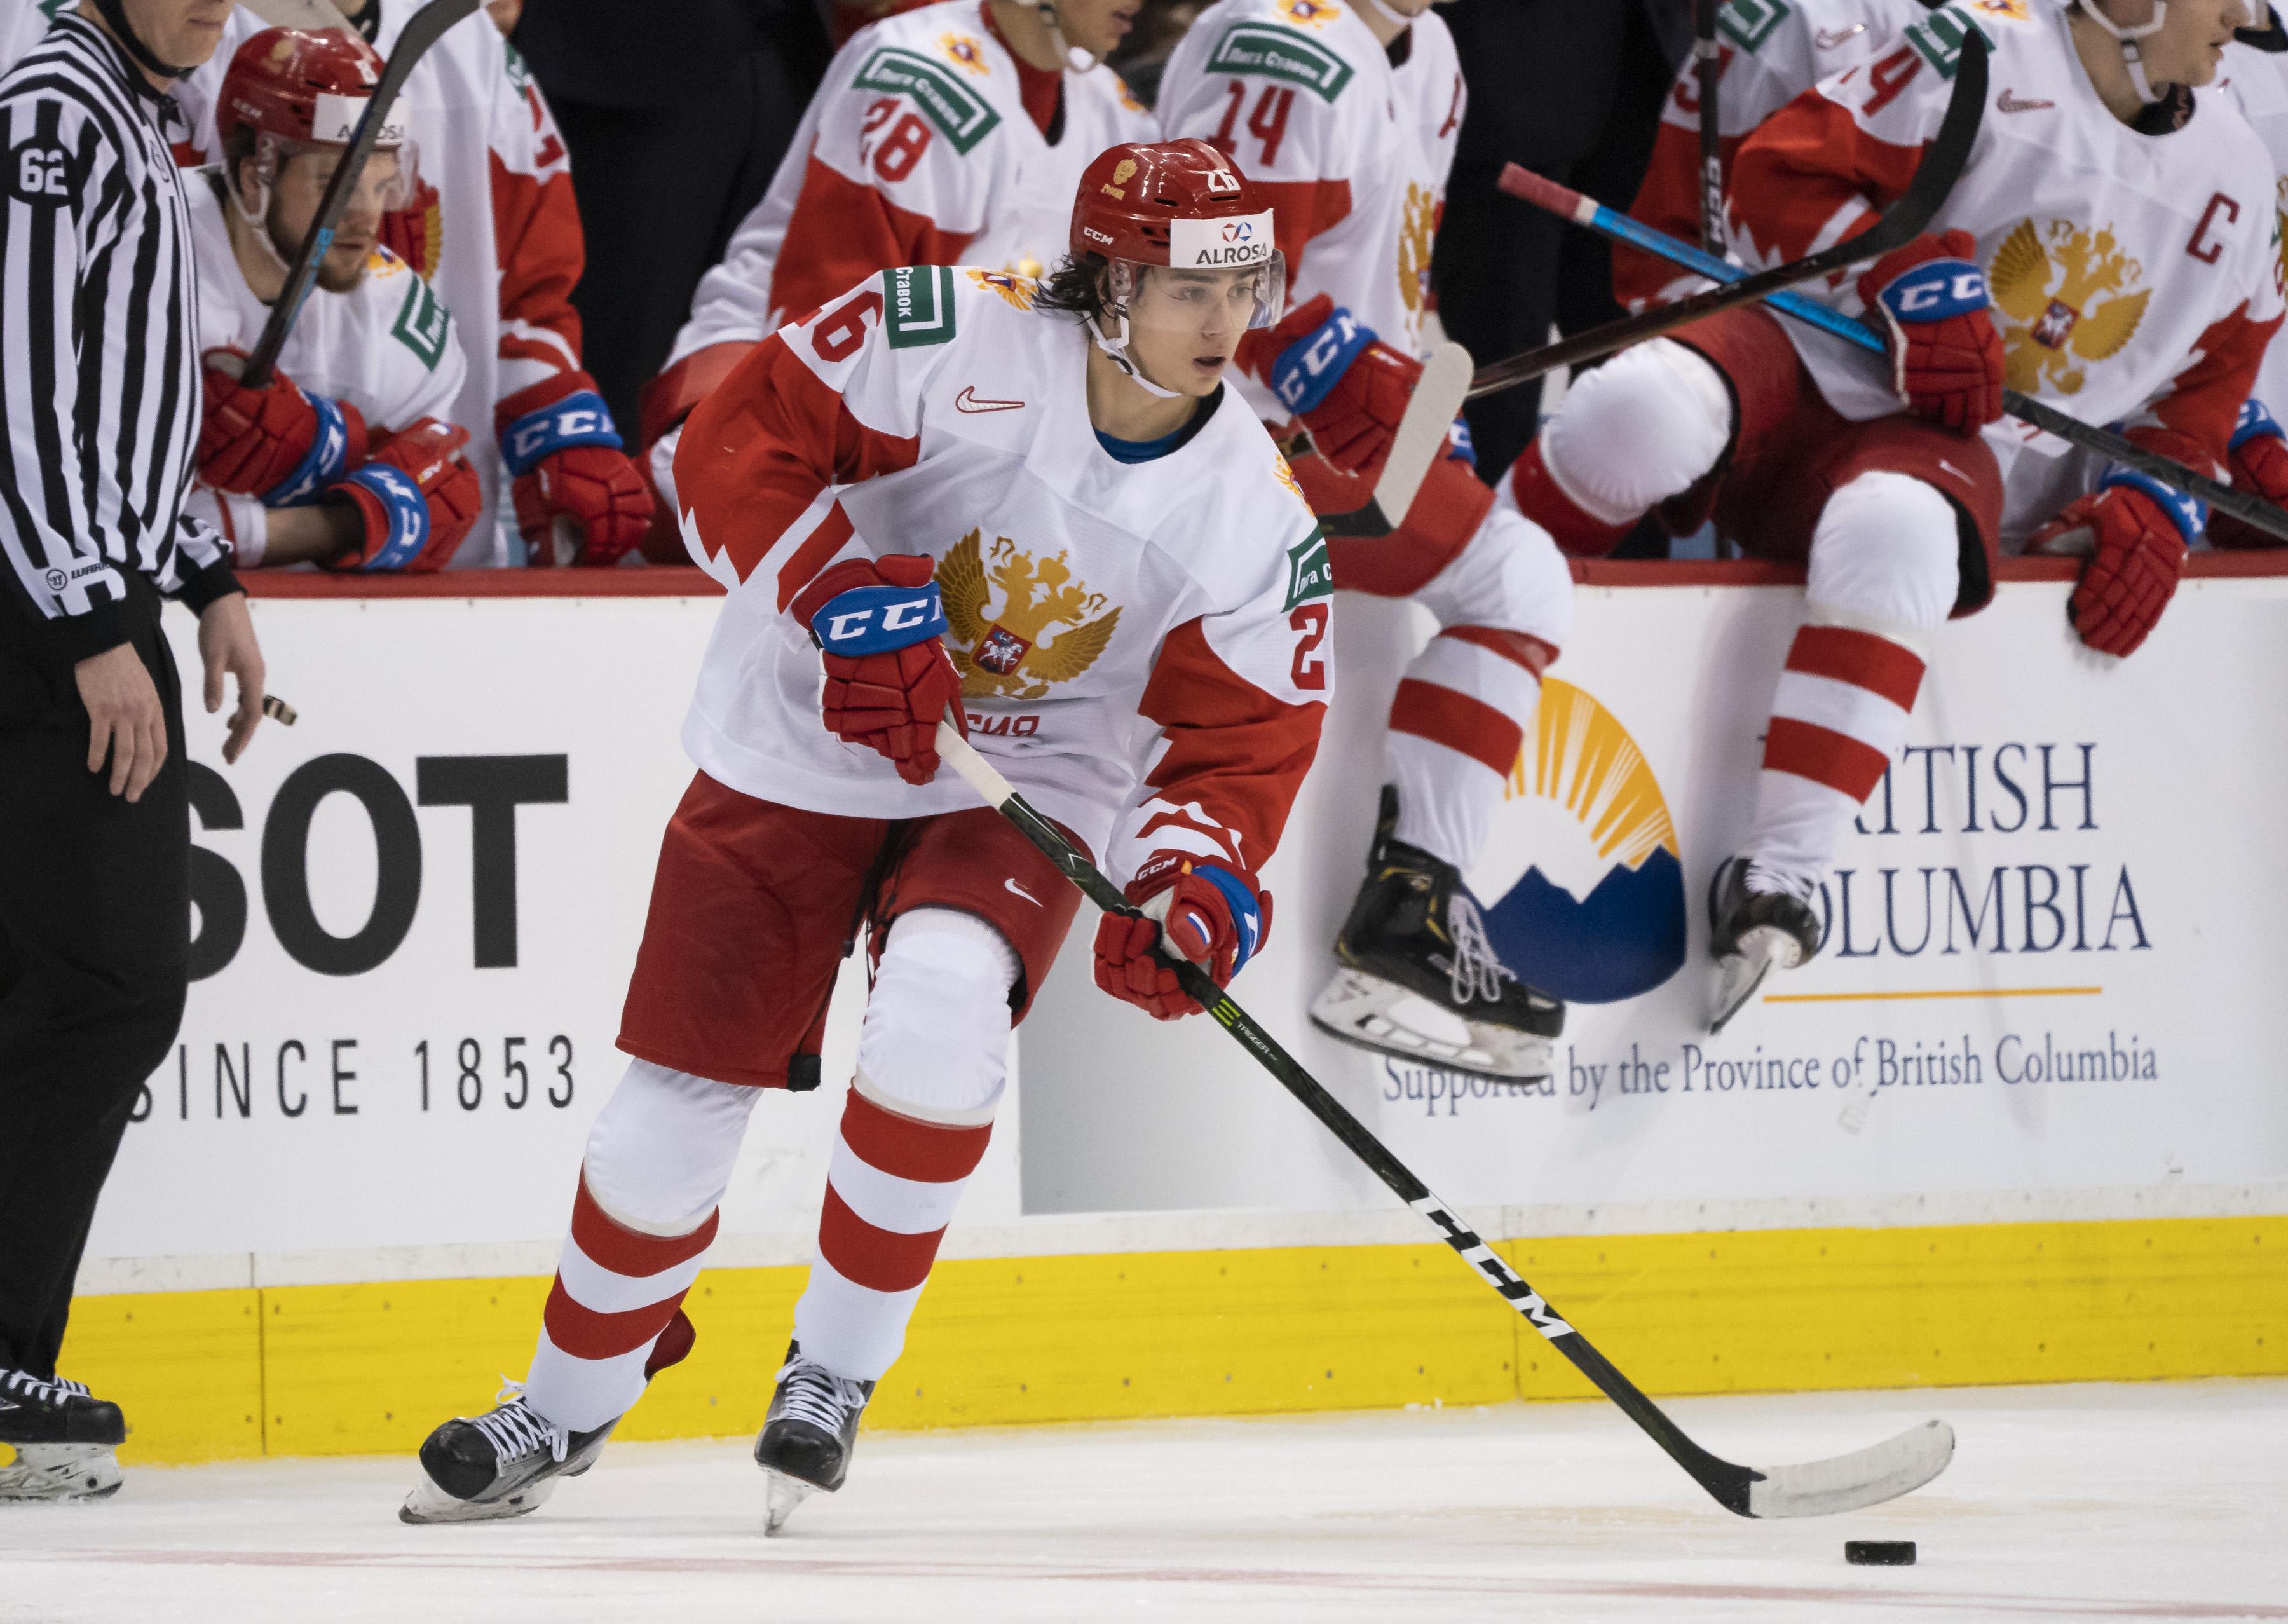 Czech Republic v Russia - 2019 IIHF World Junior Championship